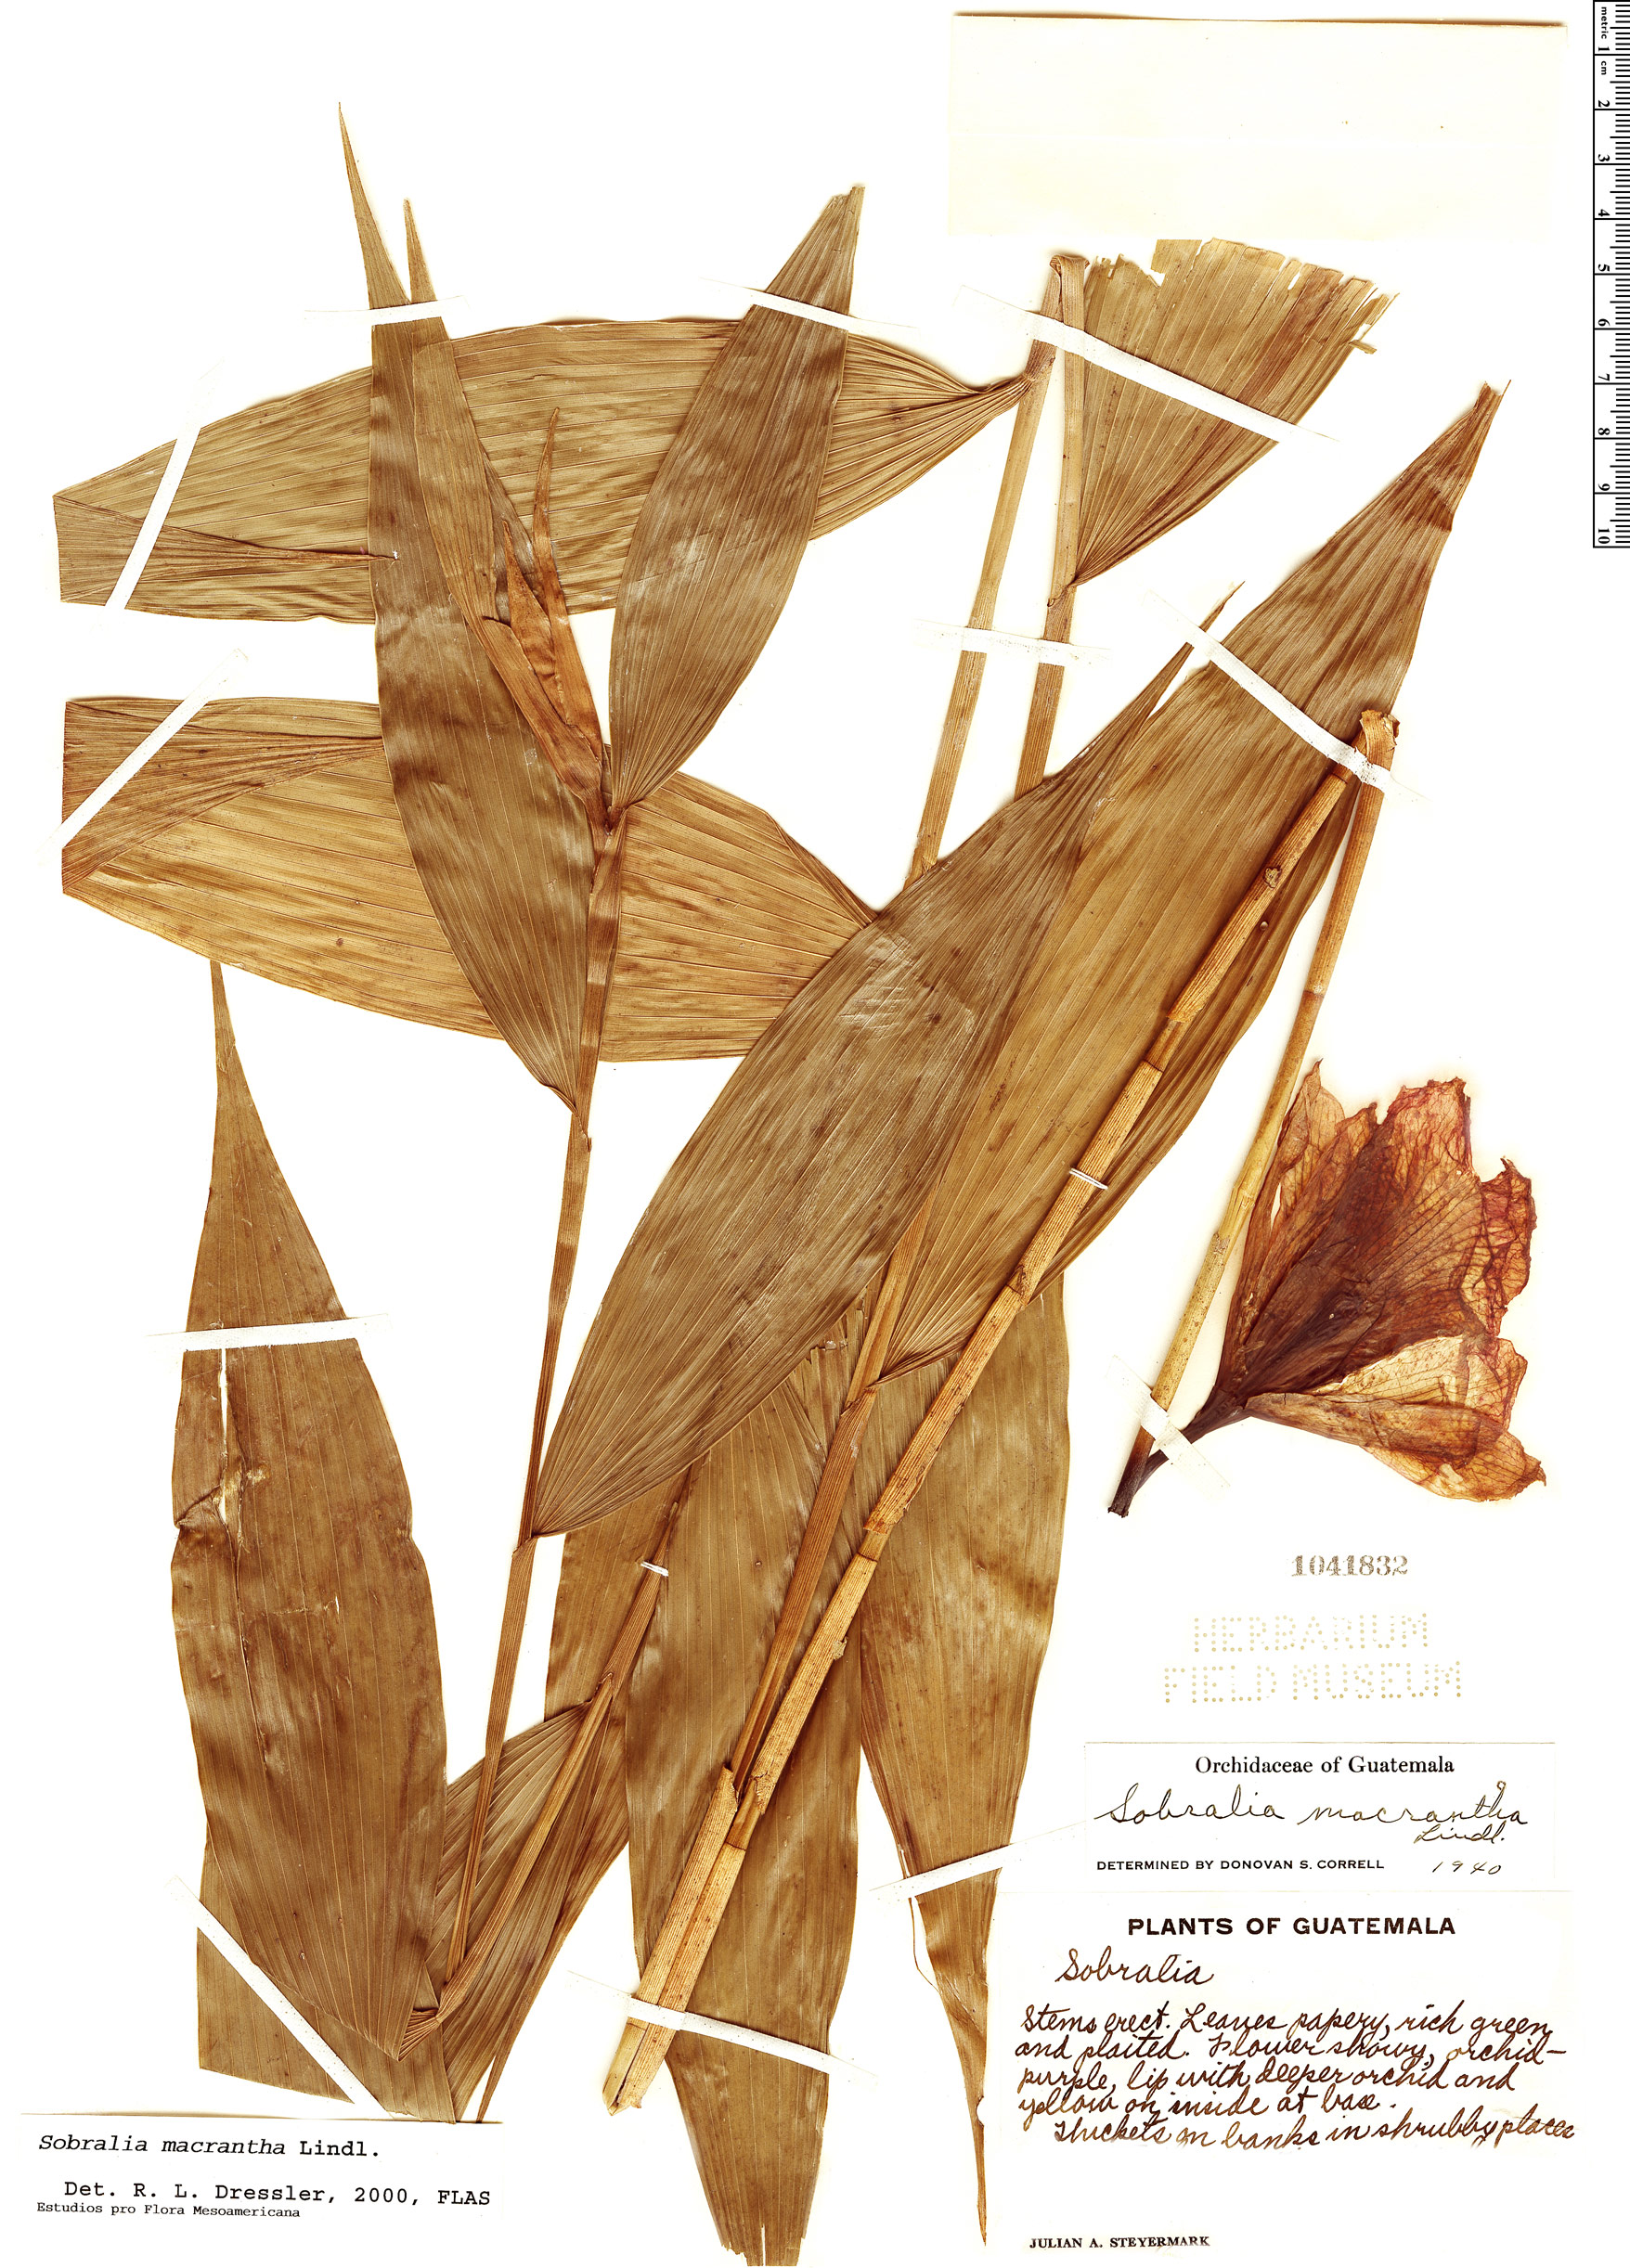 Specimen: Sobralia macrantha